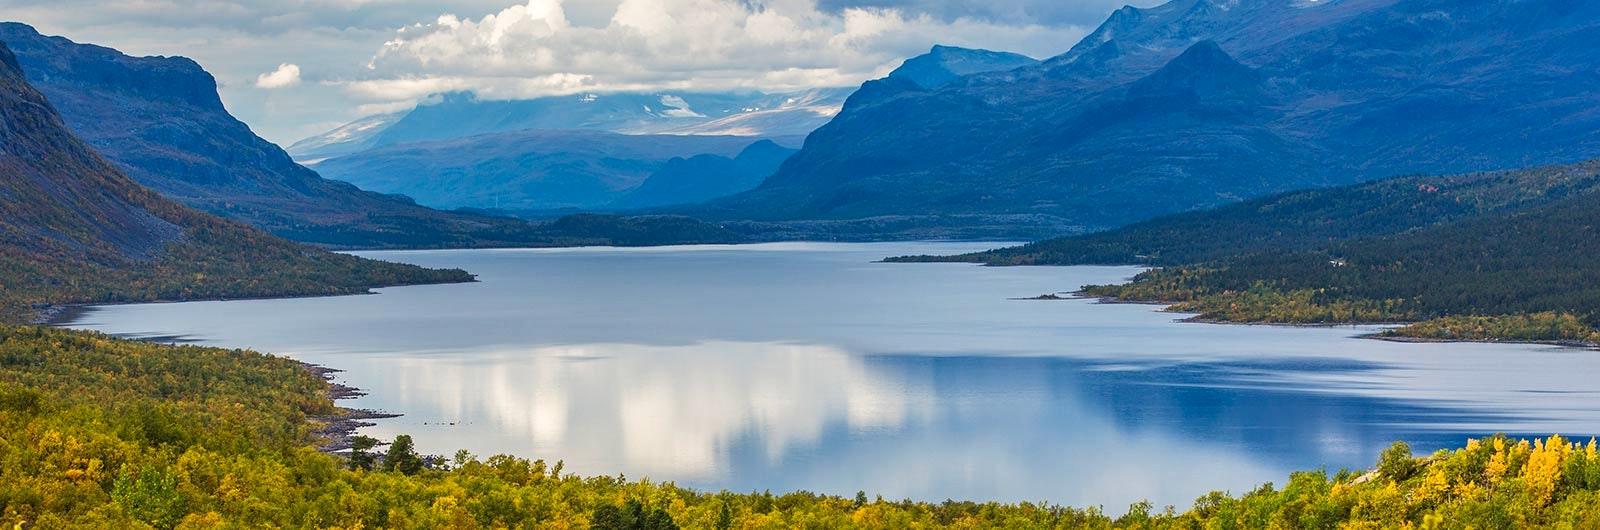 Den vackra sjön Langas vid Saltoluokta